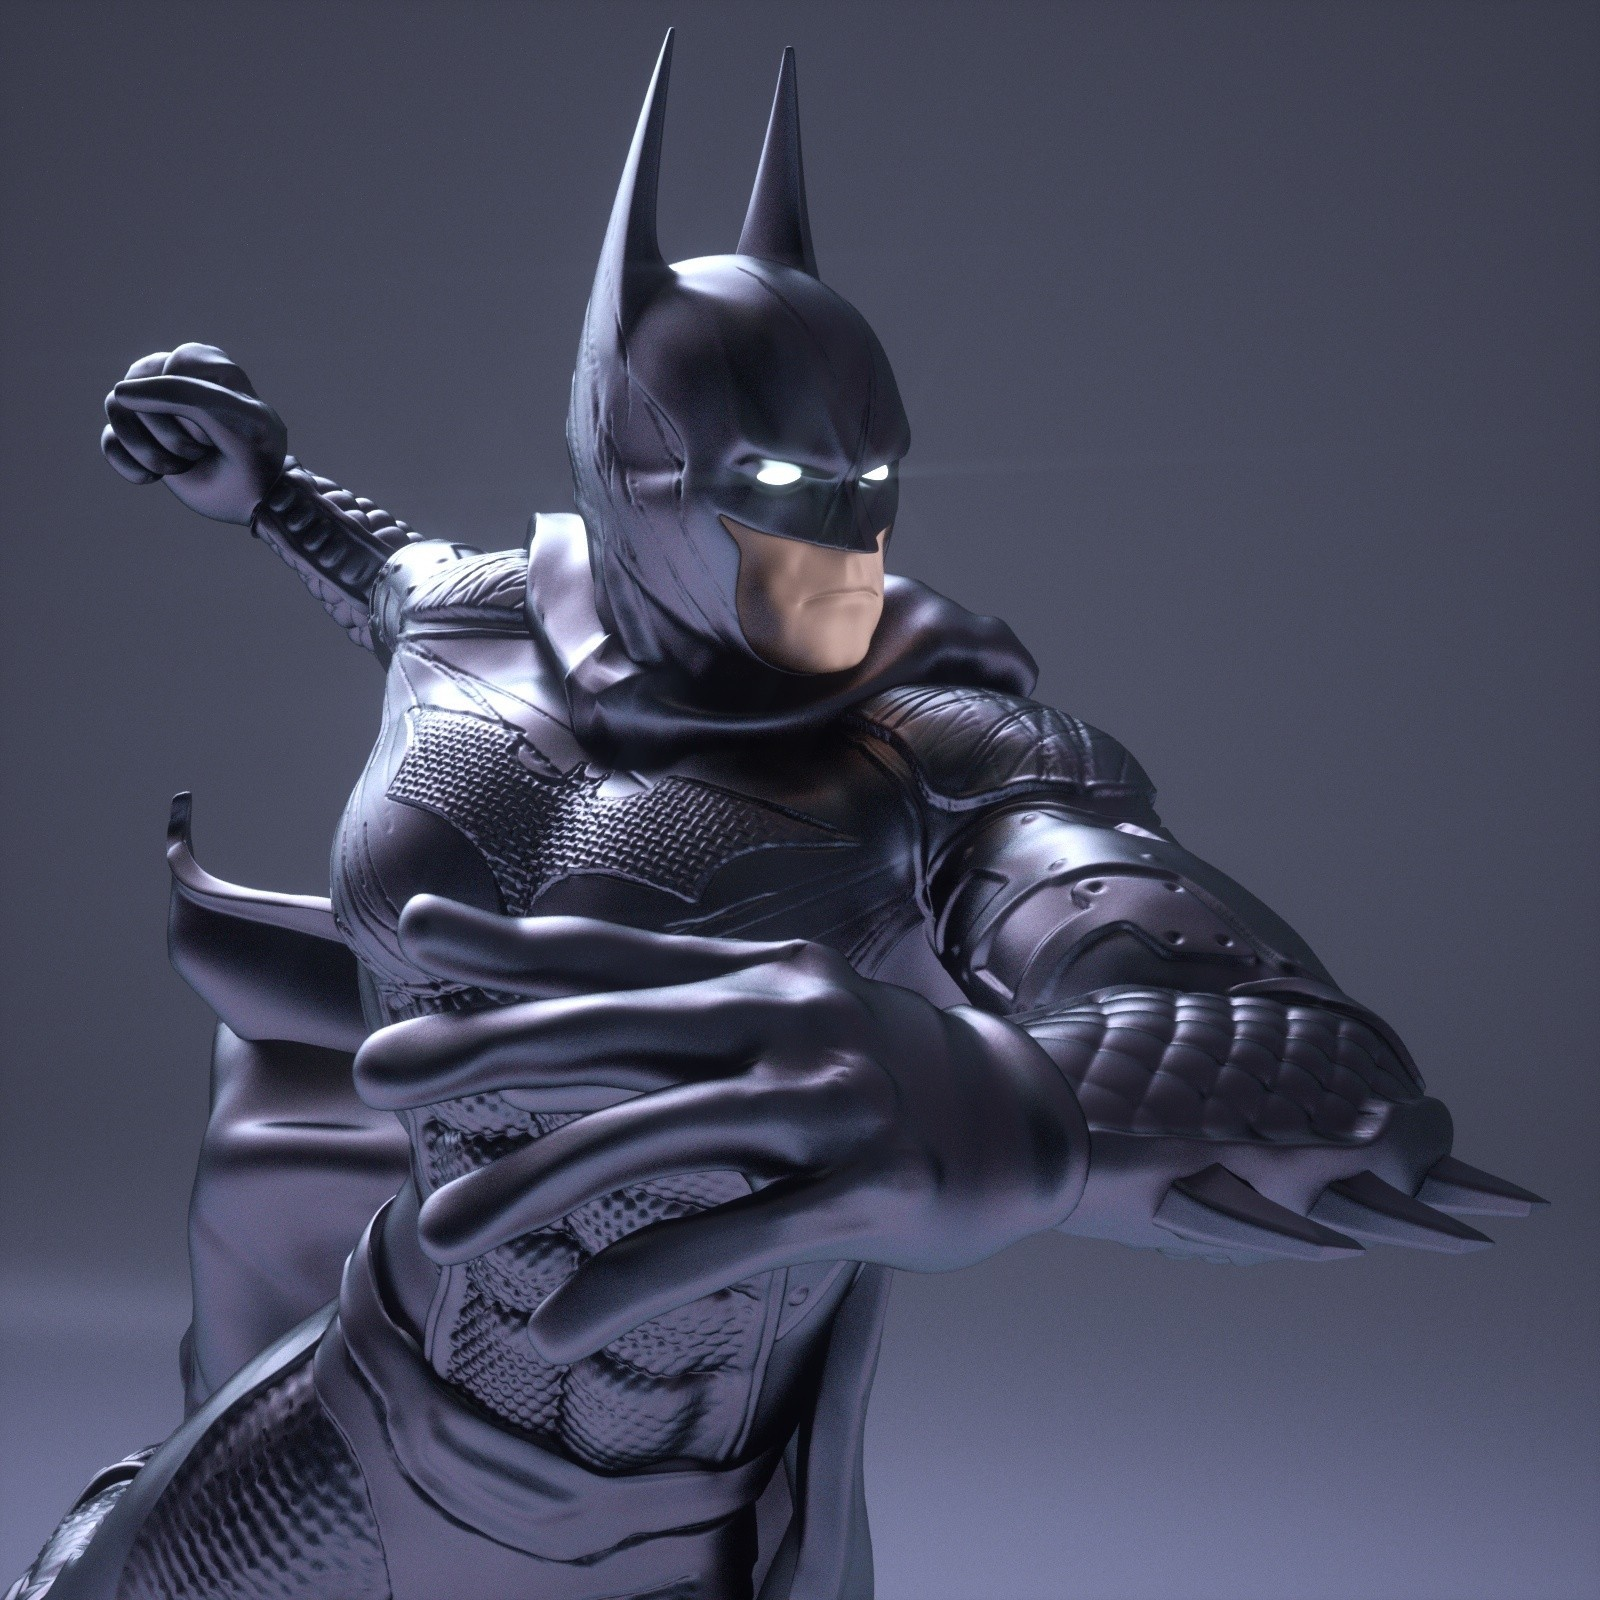 16.jpg Download OBJ file BATMAN Battle Pose • 3D print template, tolgaaxu